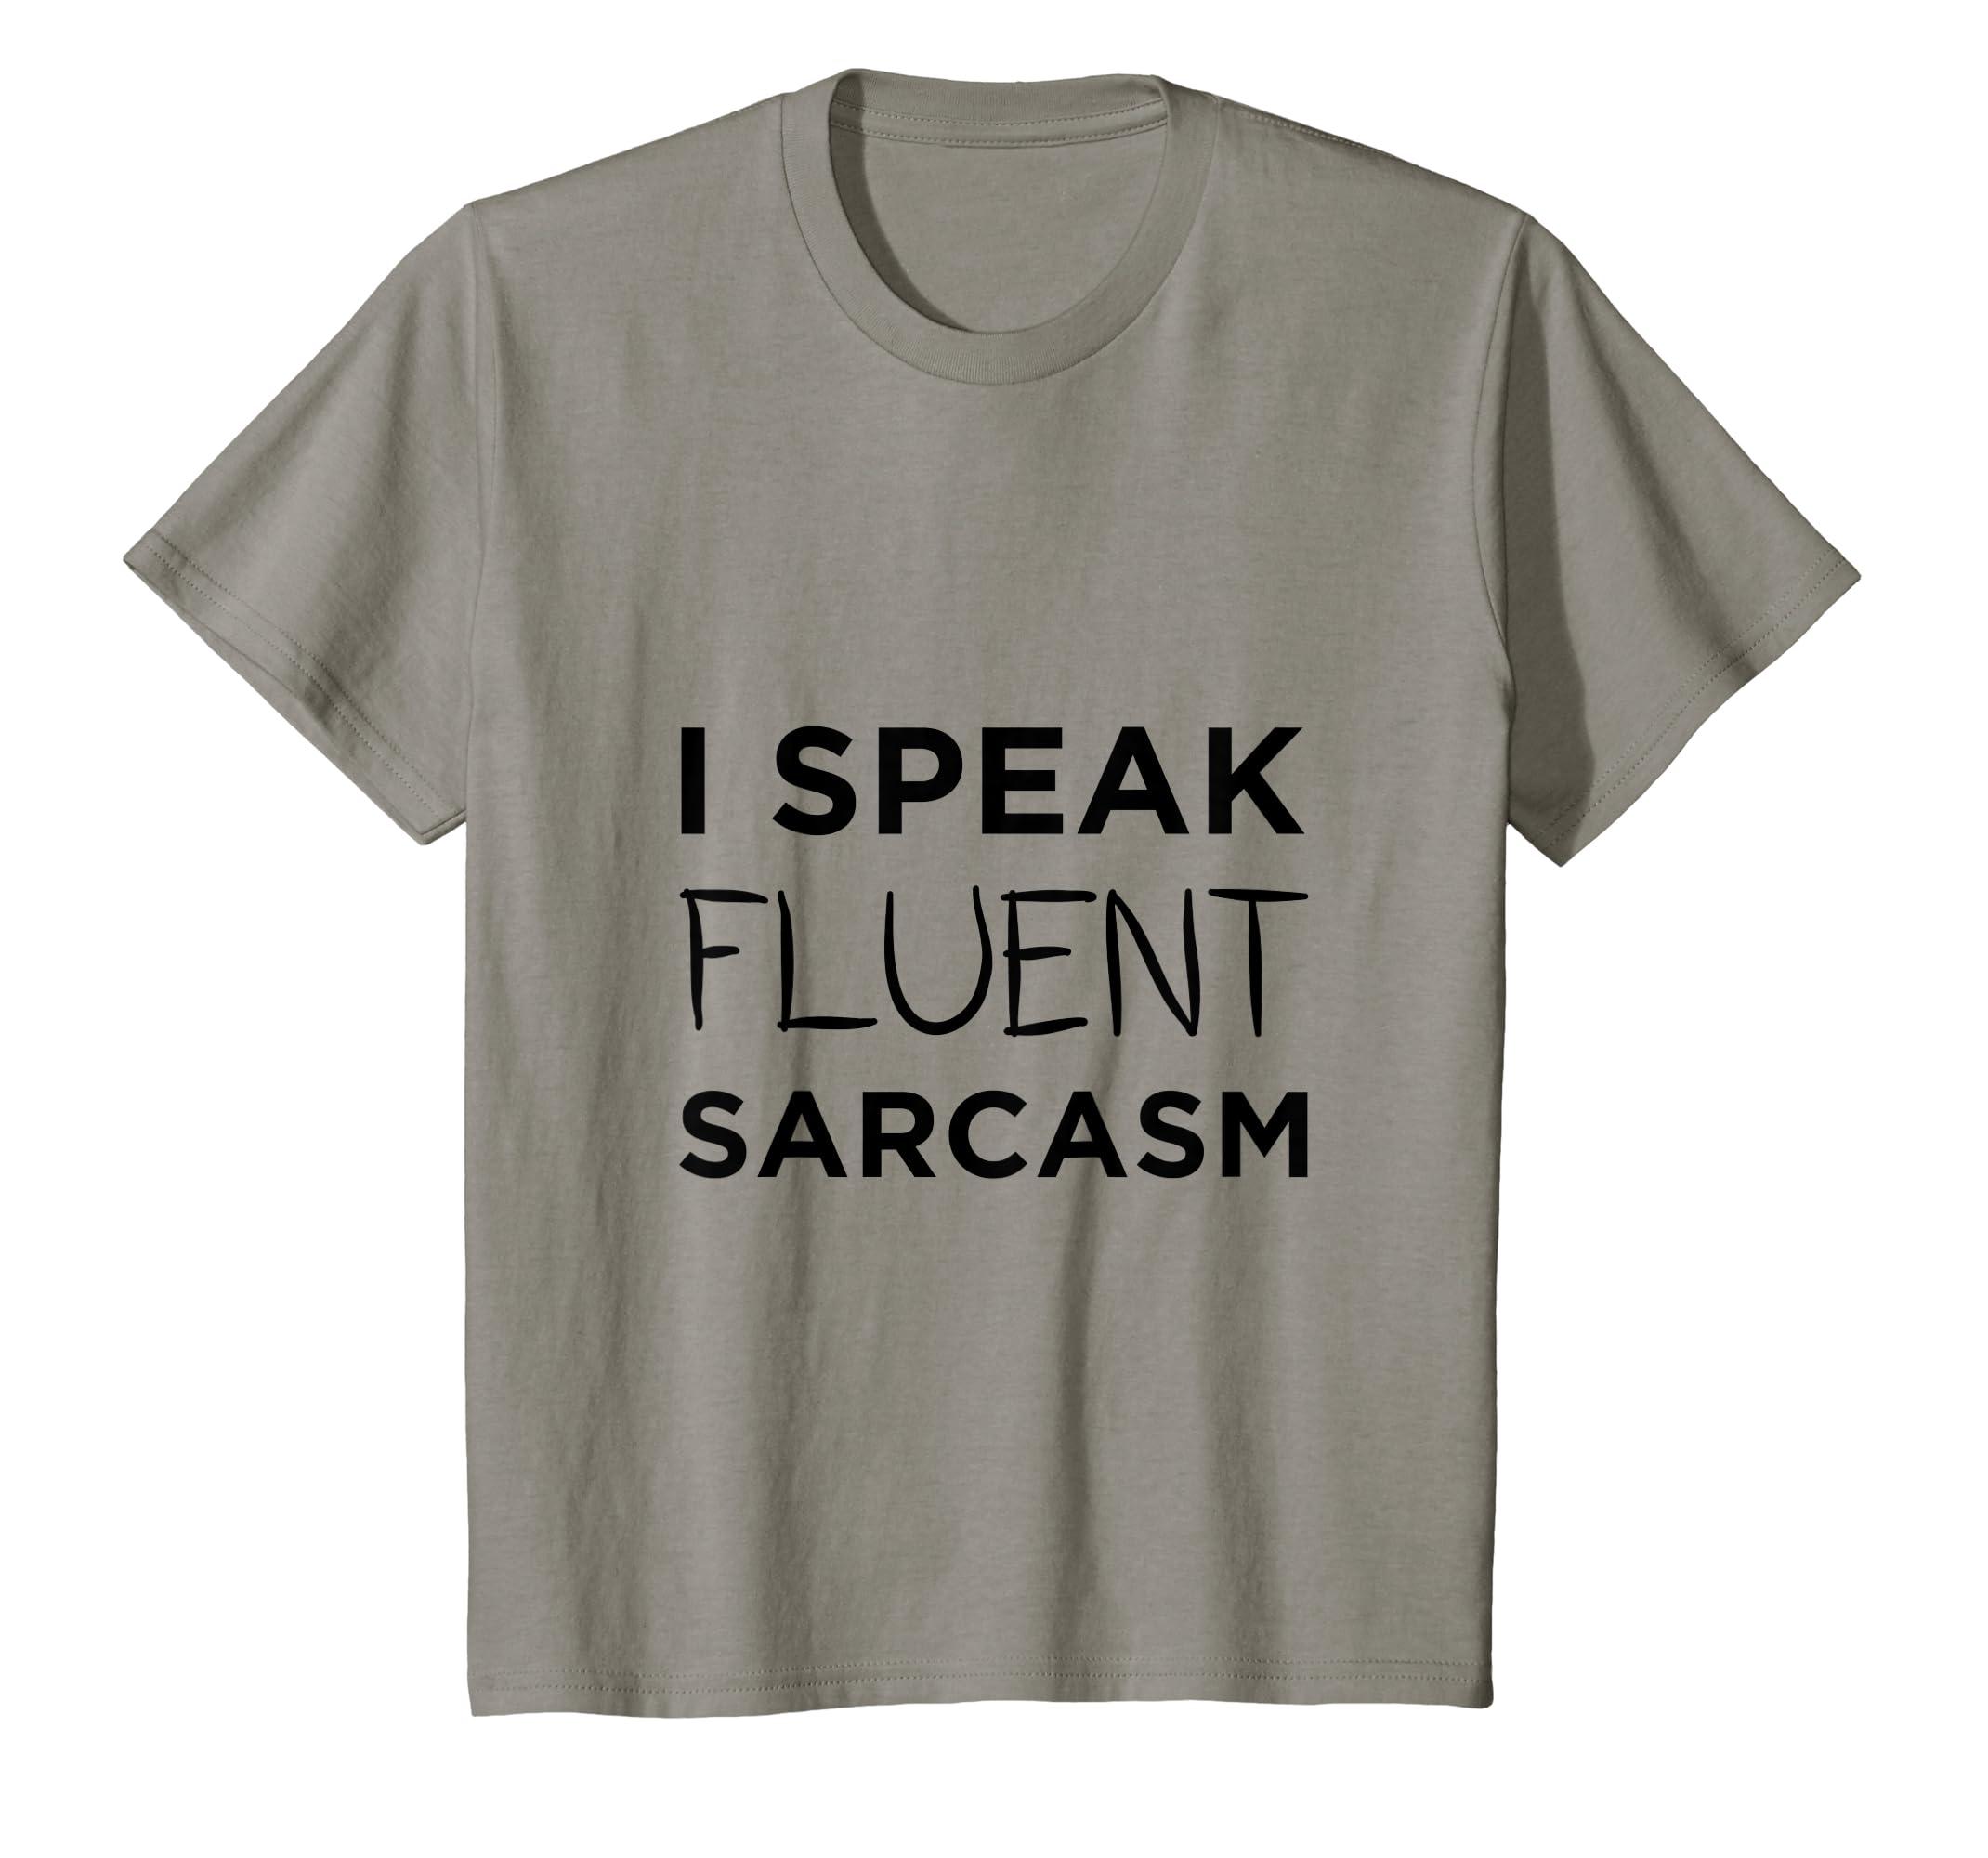 cd89b9315 Amazon.com: I Speak Fluent Sarcasm - Funny Sarcastic T-Shirt: Clothing